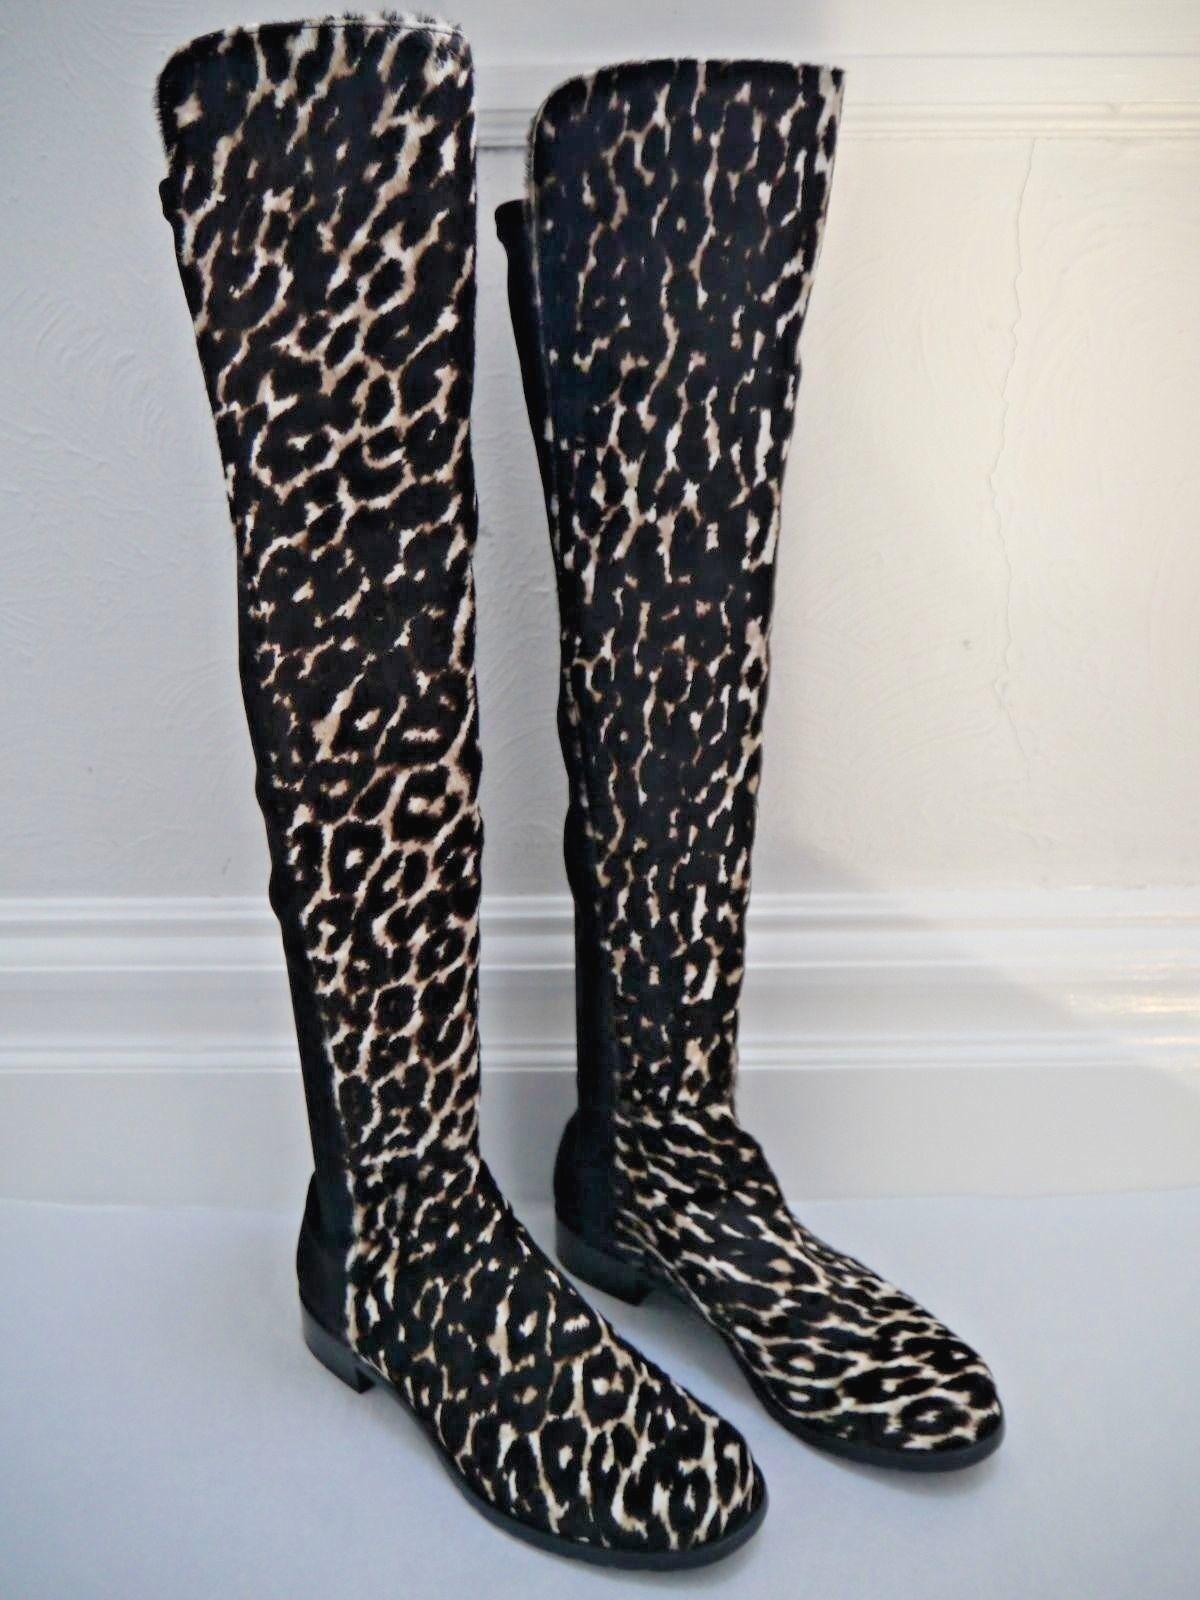 STUART WEITZMAN 5050 leopard calf hair over the knee OTK boots size 9 WORN ONCE